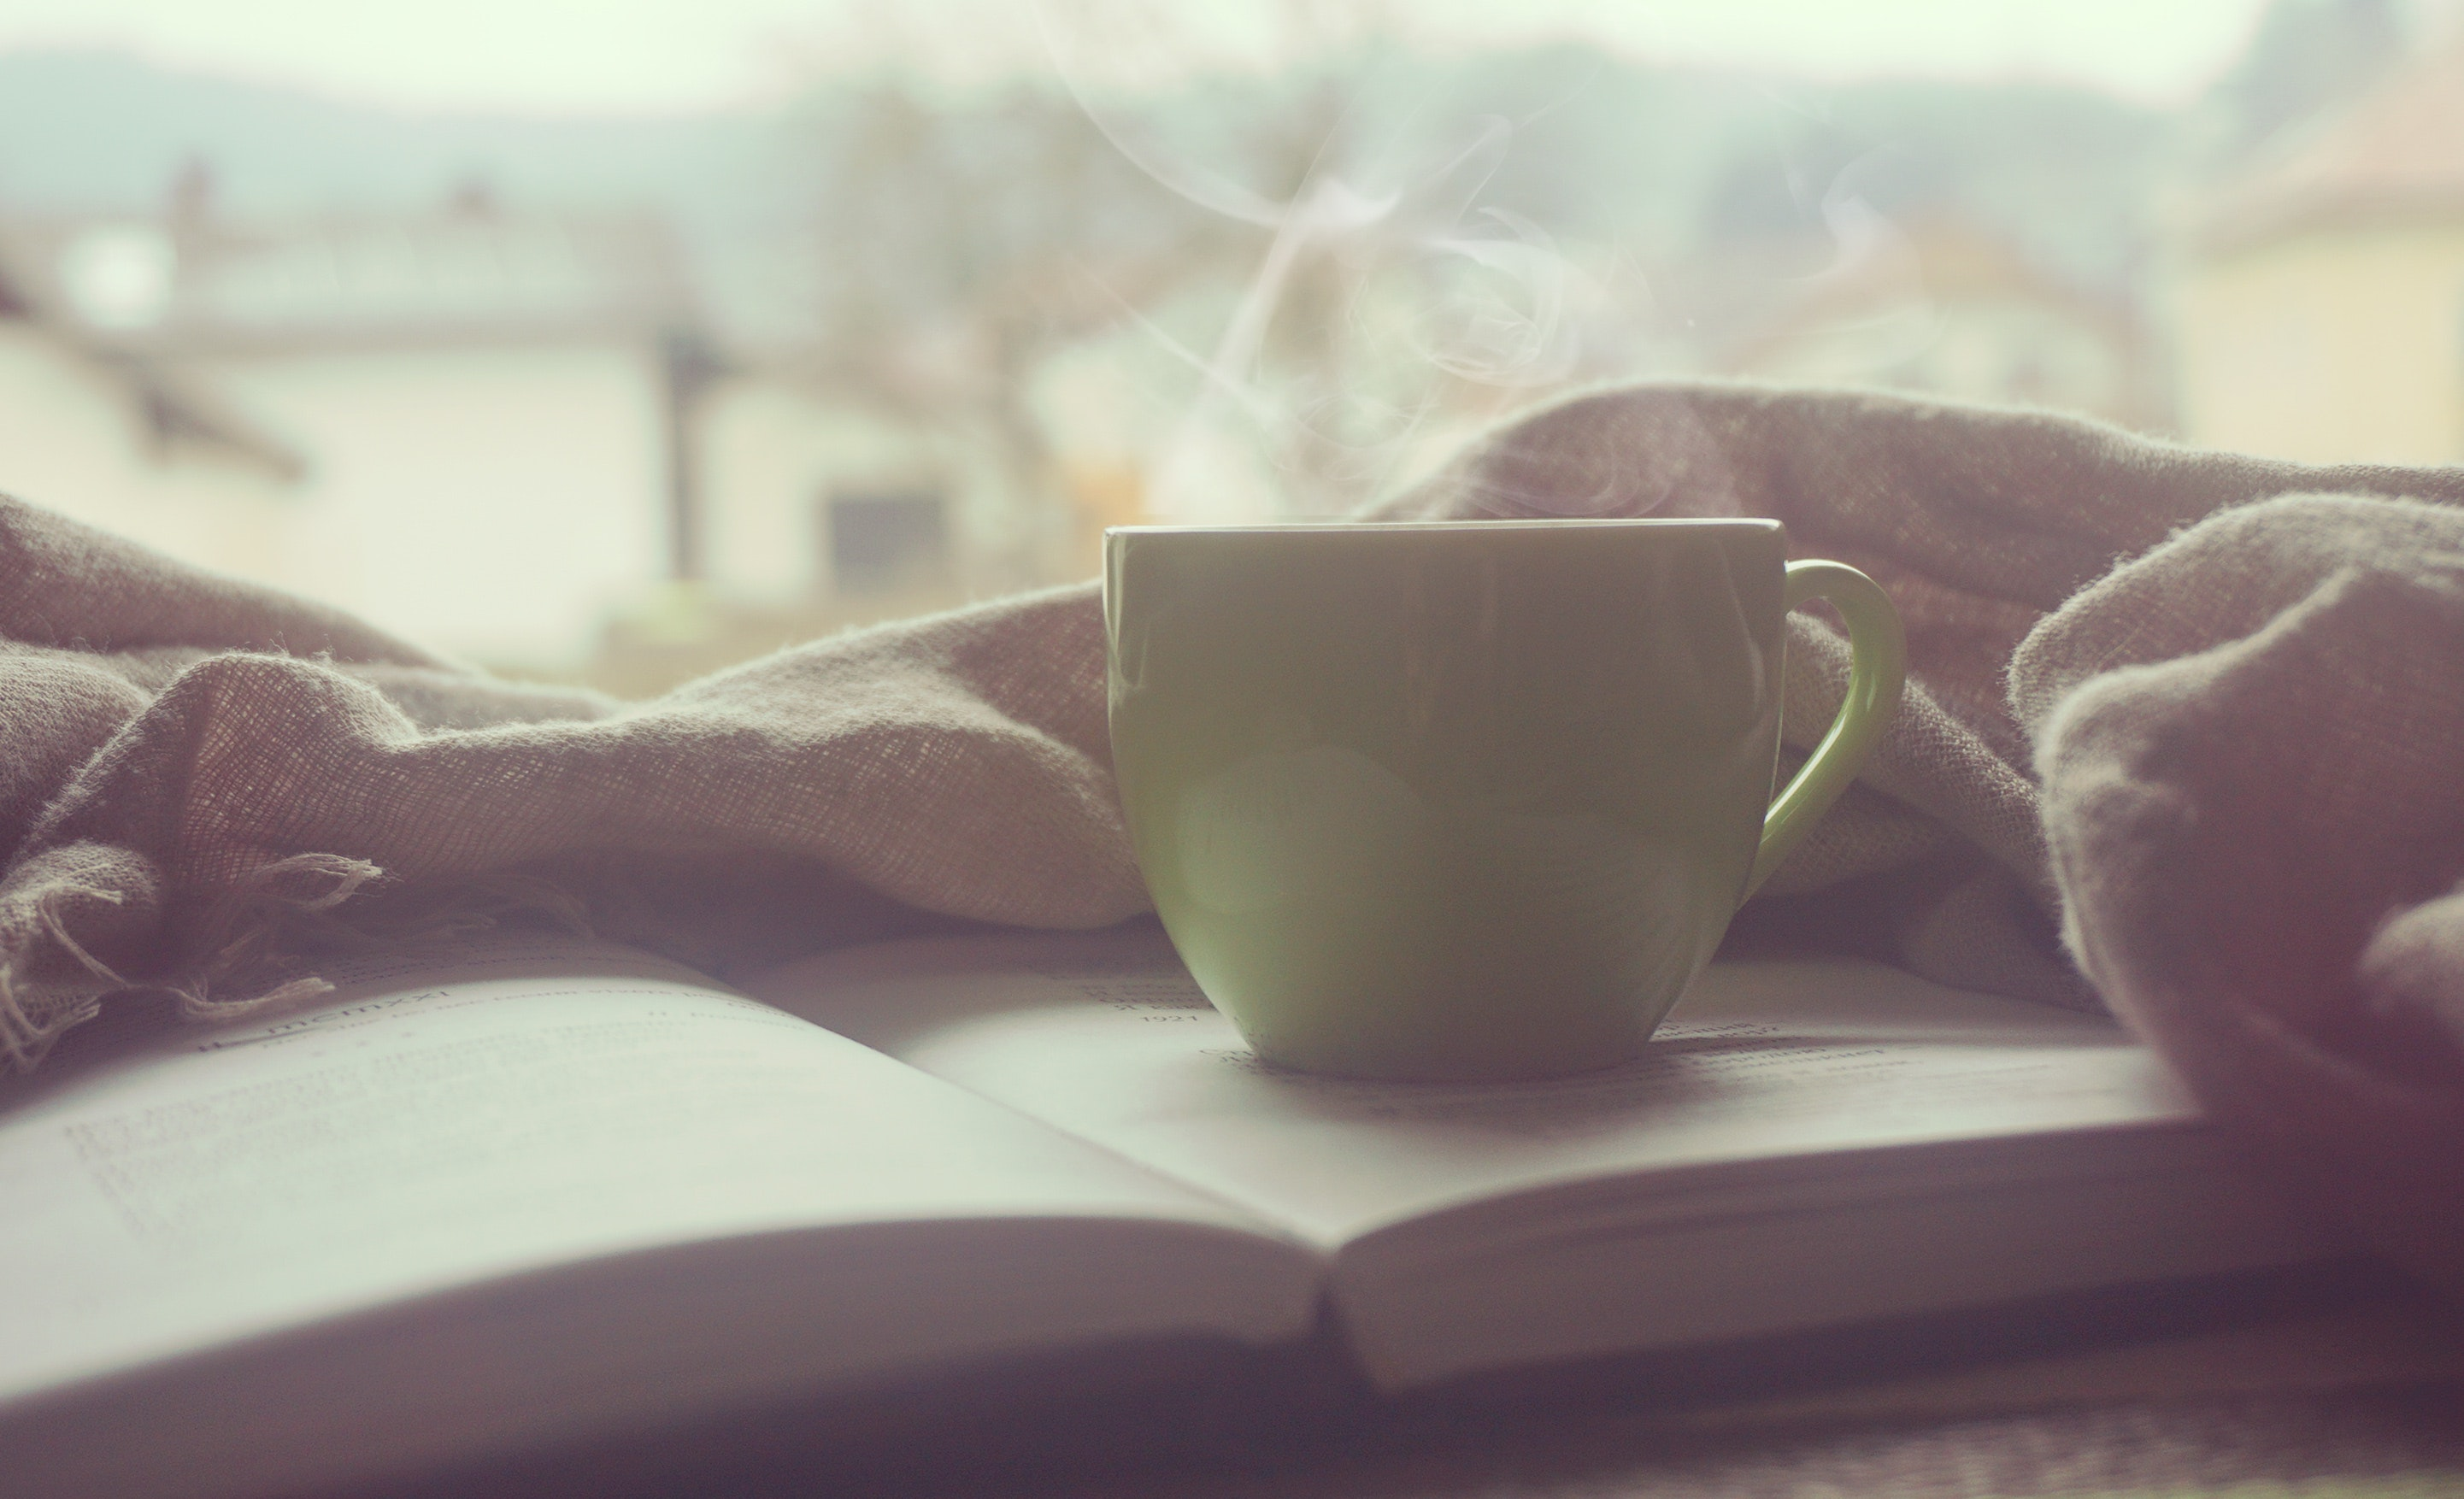 White Hot Mug on Book Near Linen, Beverage, Book, Coffee, Coffee drink, HQ Photo